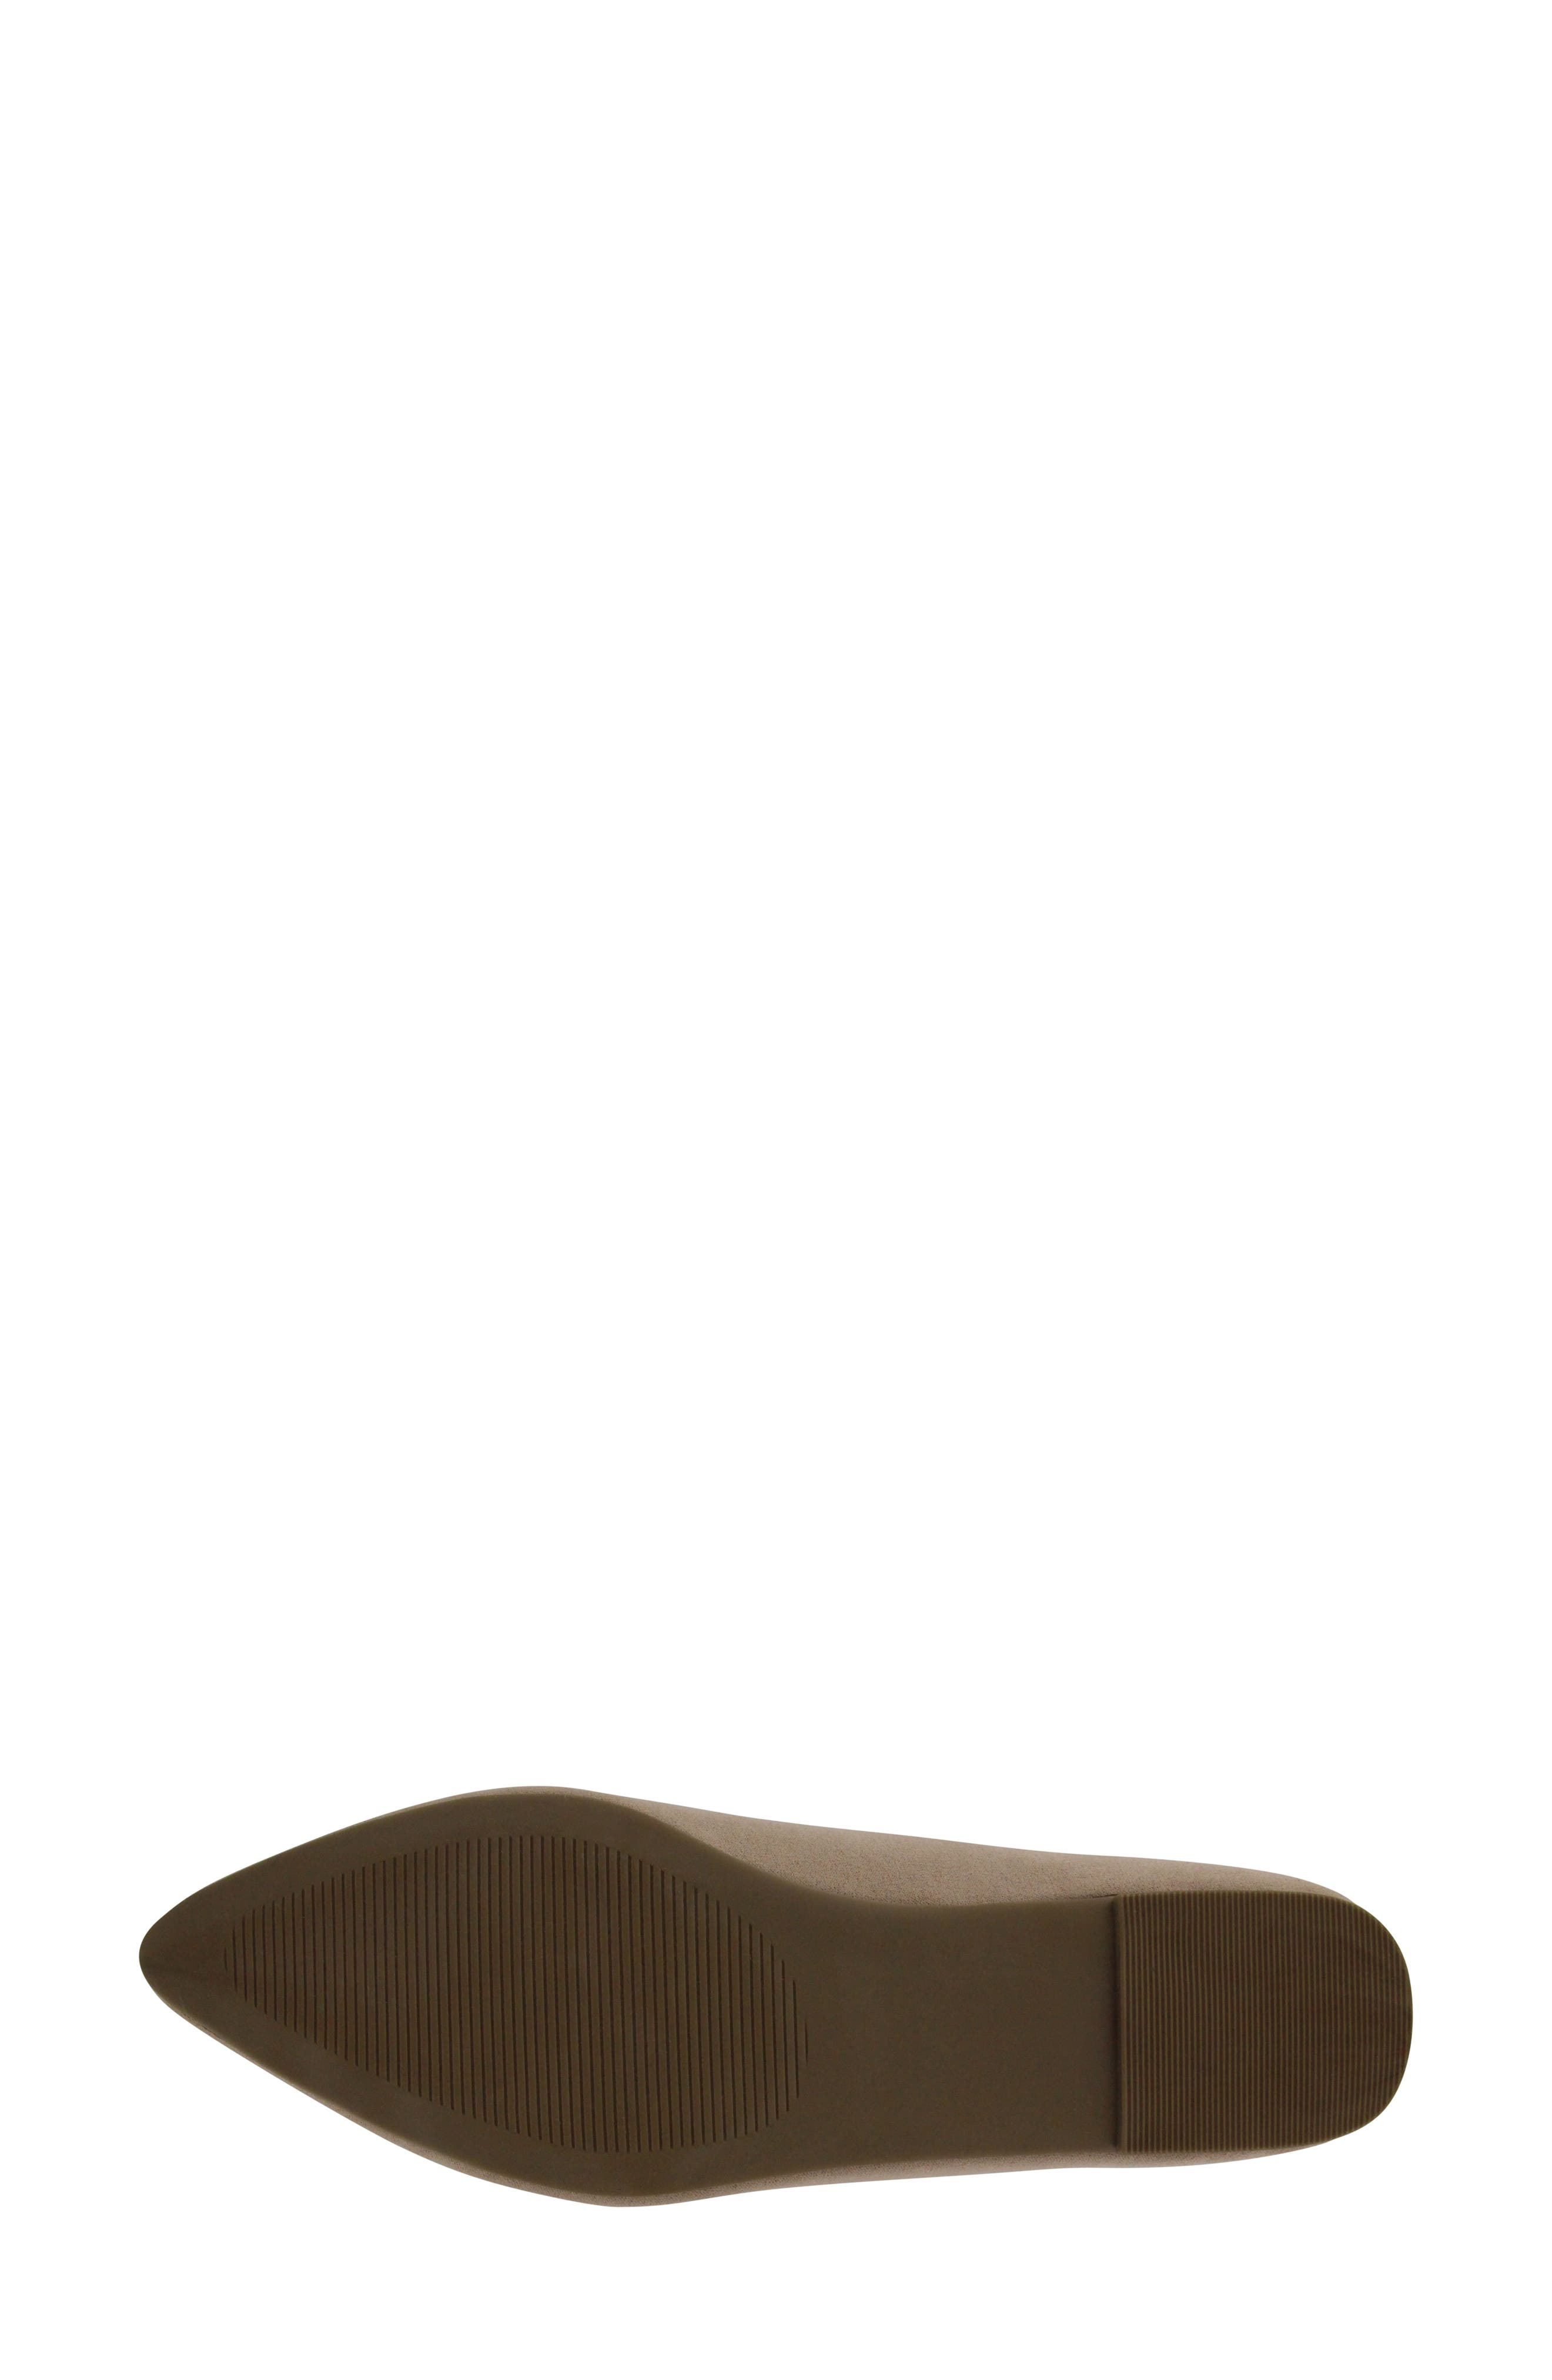 Niles Loafer,                             Alternate thumbnail 5, color,                             Natural